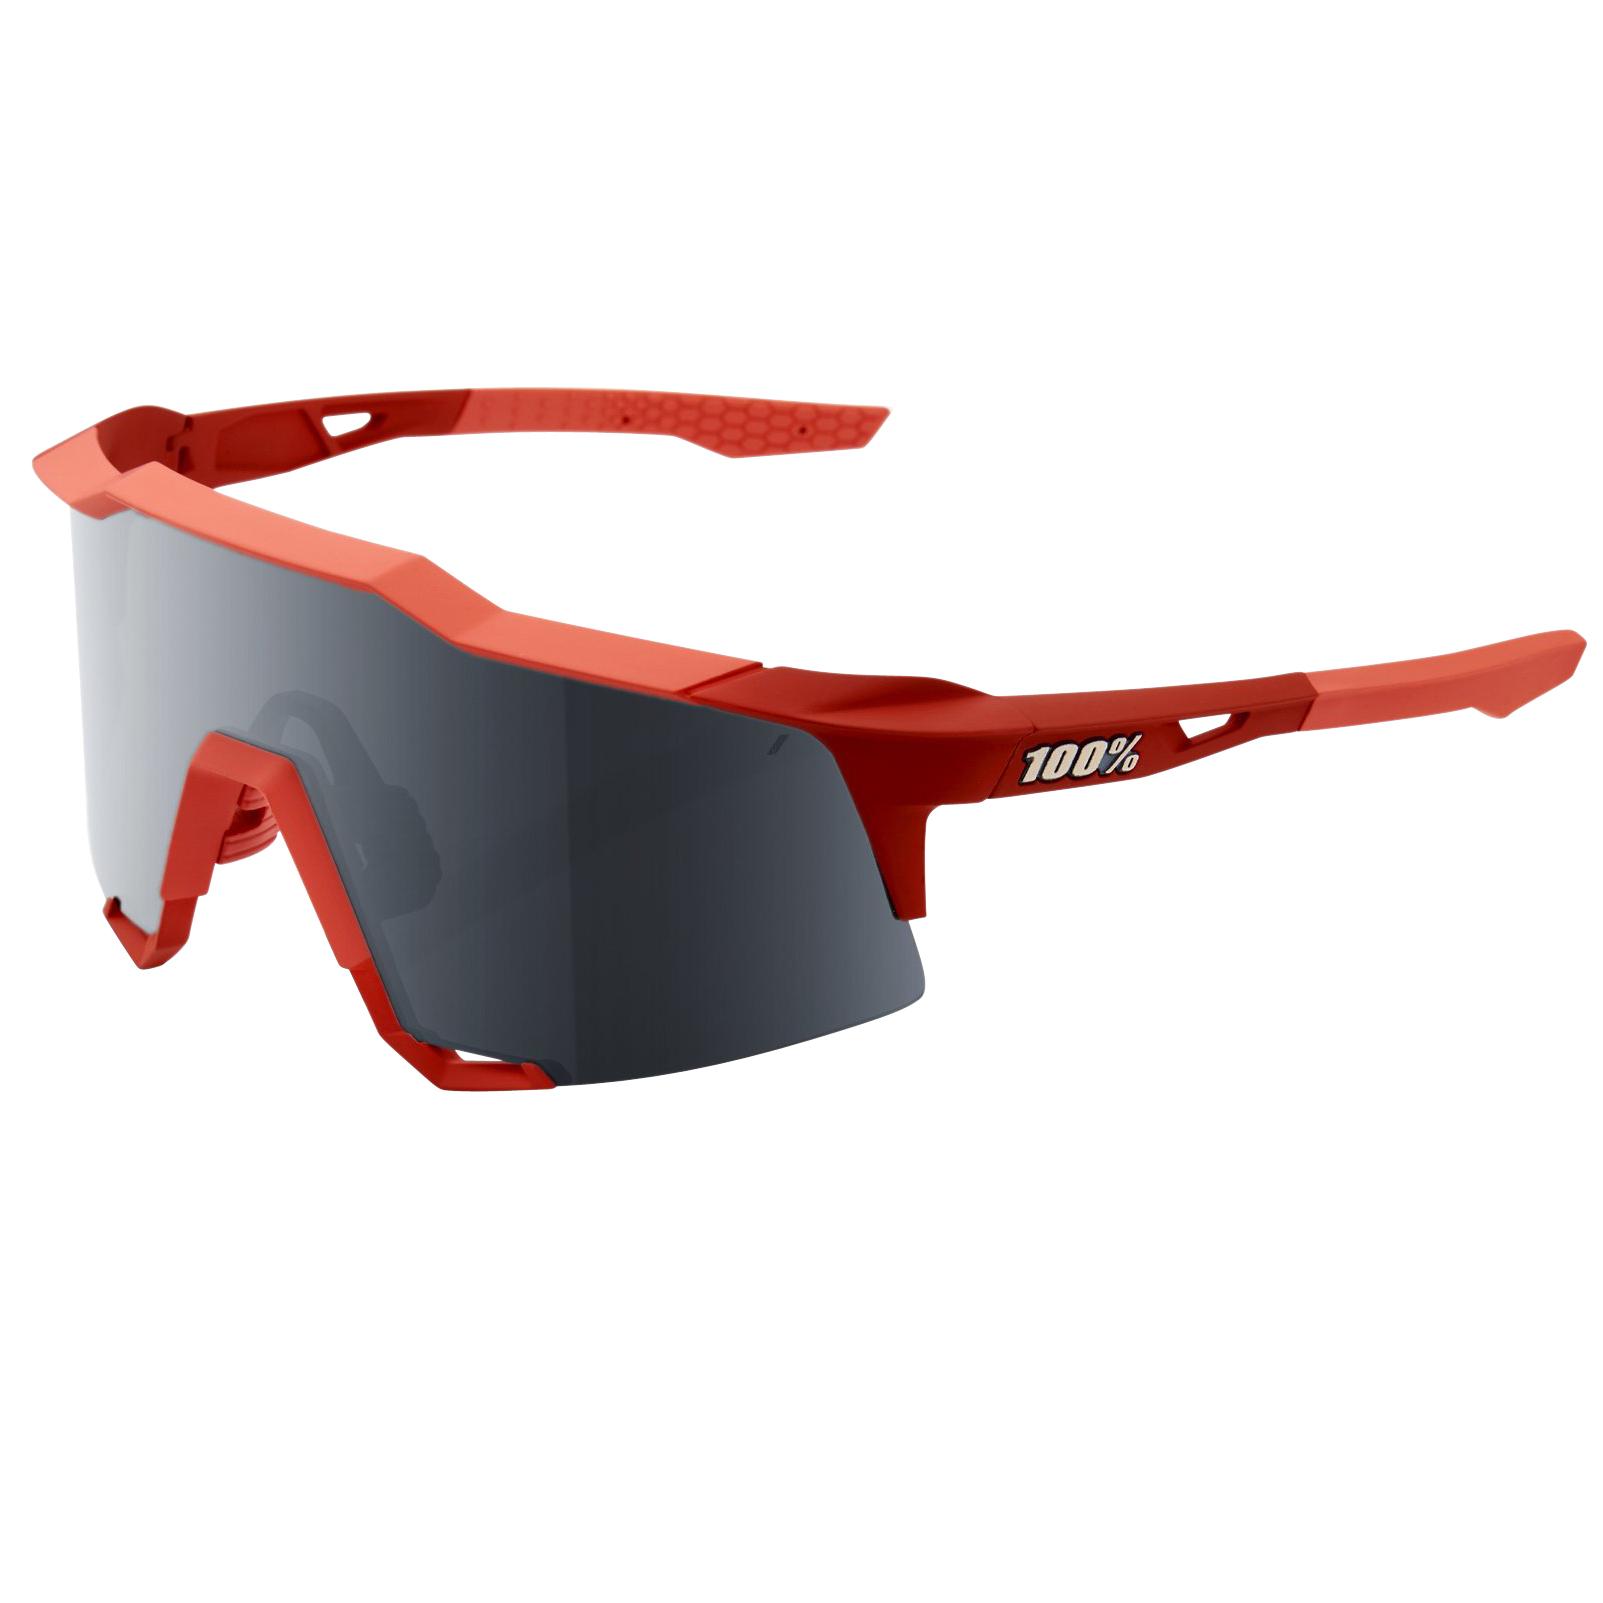 100% Speedcraft - Tall - Mirror Lense Gafas - Soft Tact Coral/Black Mirror + Clear